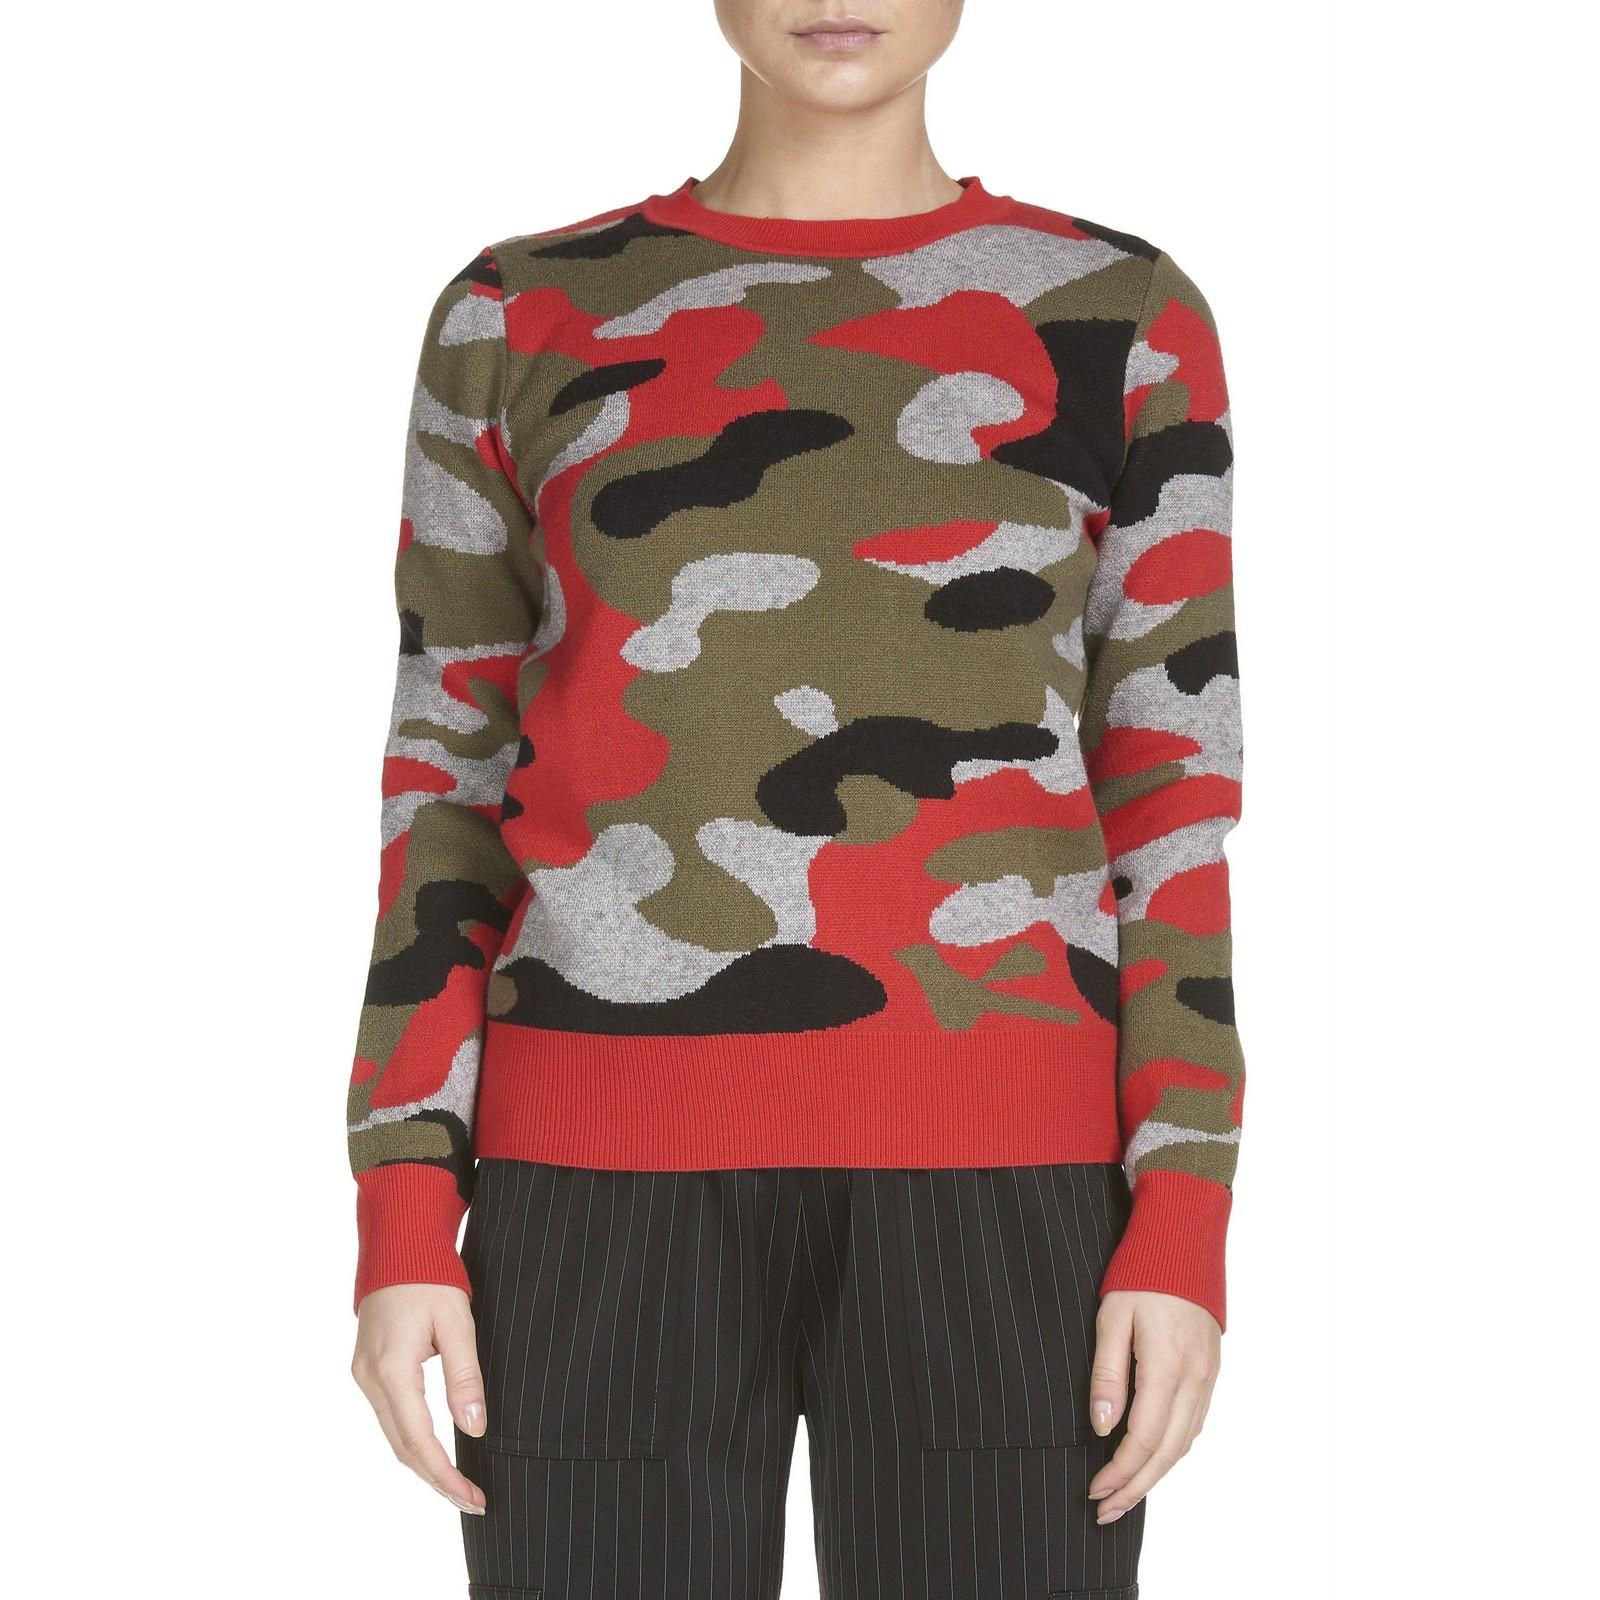 Kazan Sweater (Red Camo)